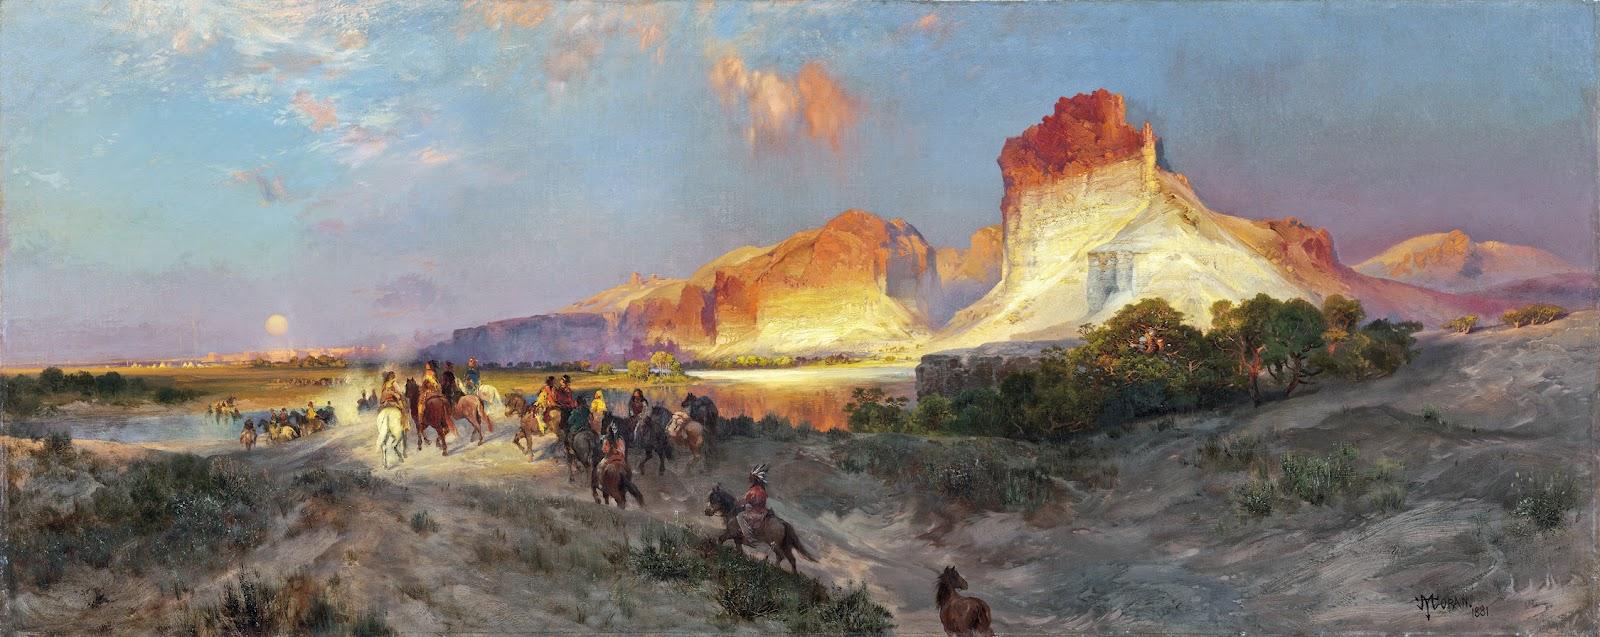 Thomas Moran - Green River Cliffs, Wyoming